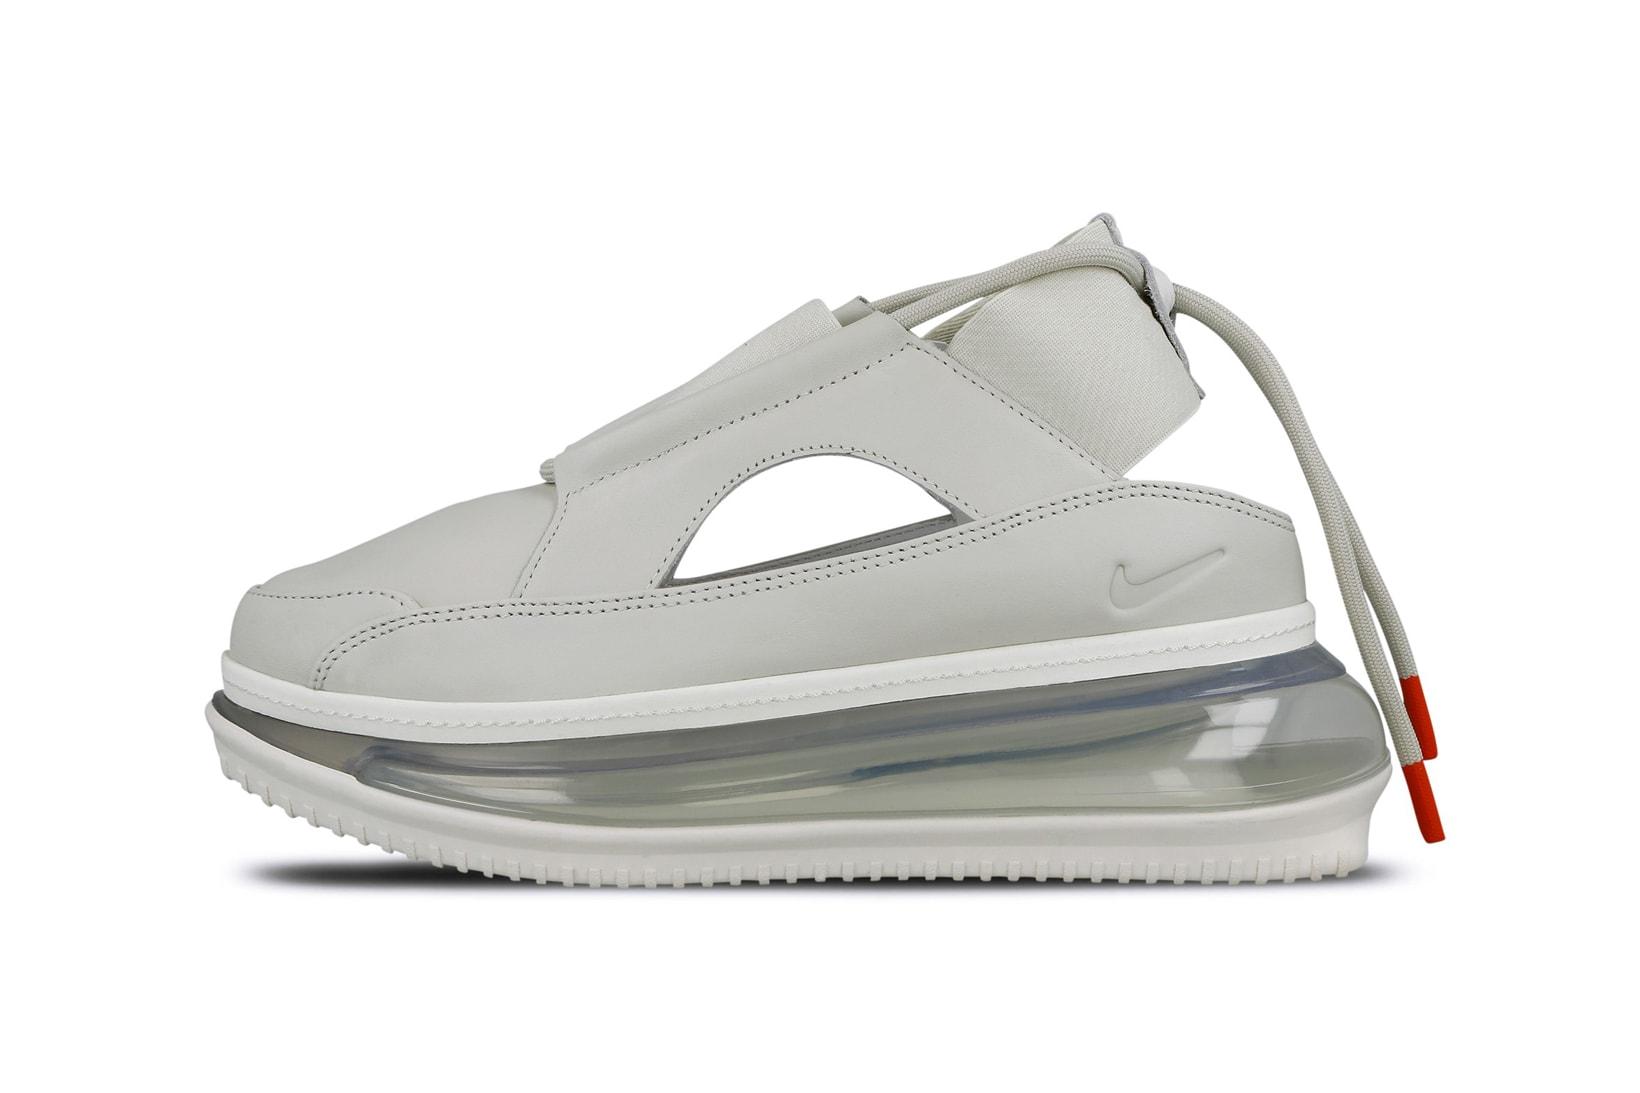 26662288e5 Meet Nike's New Women's Platform Sneaker, the Air Max FF 720